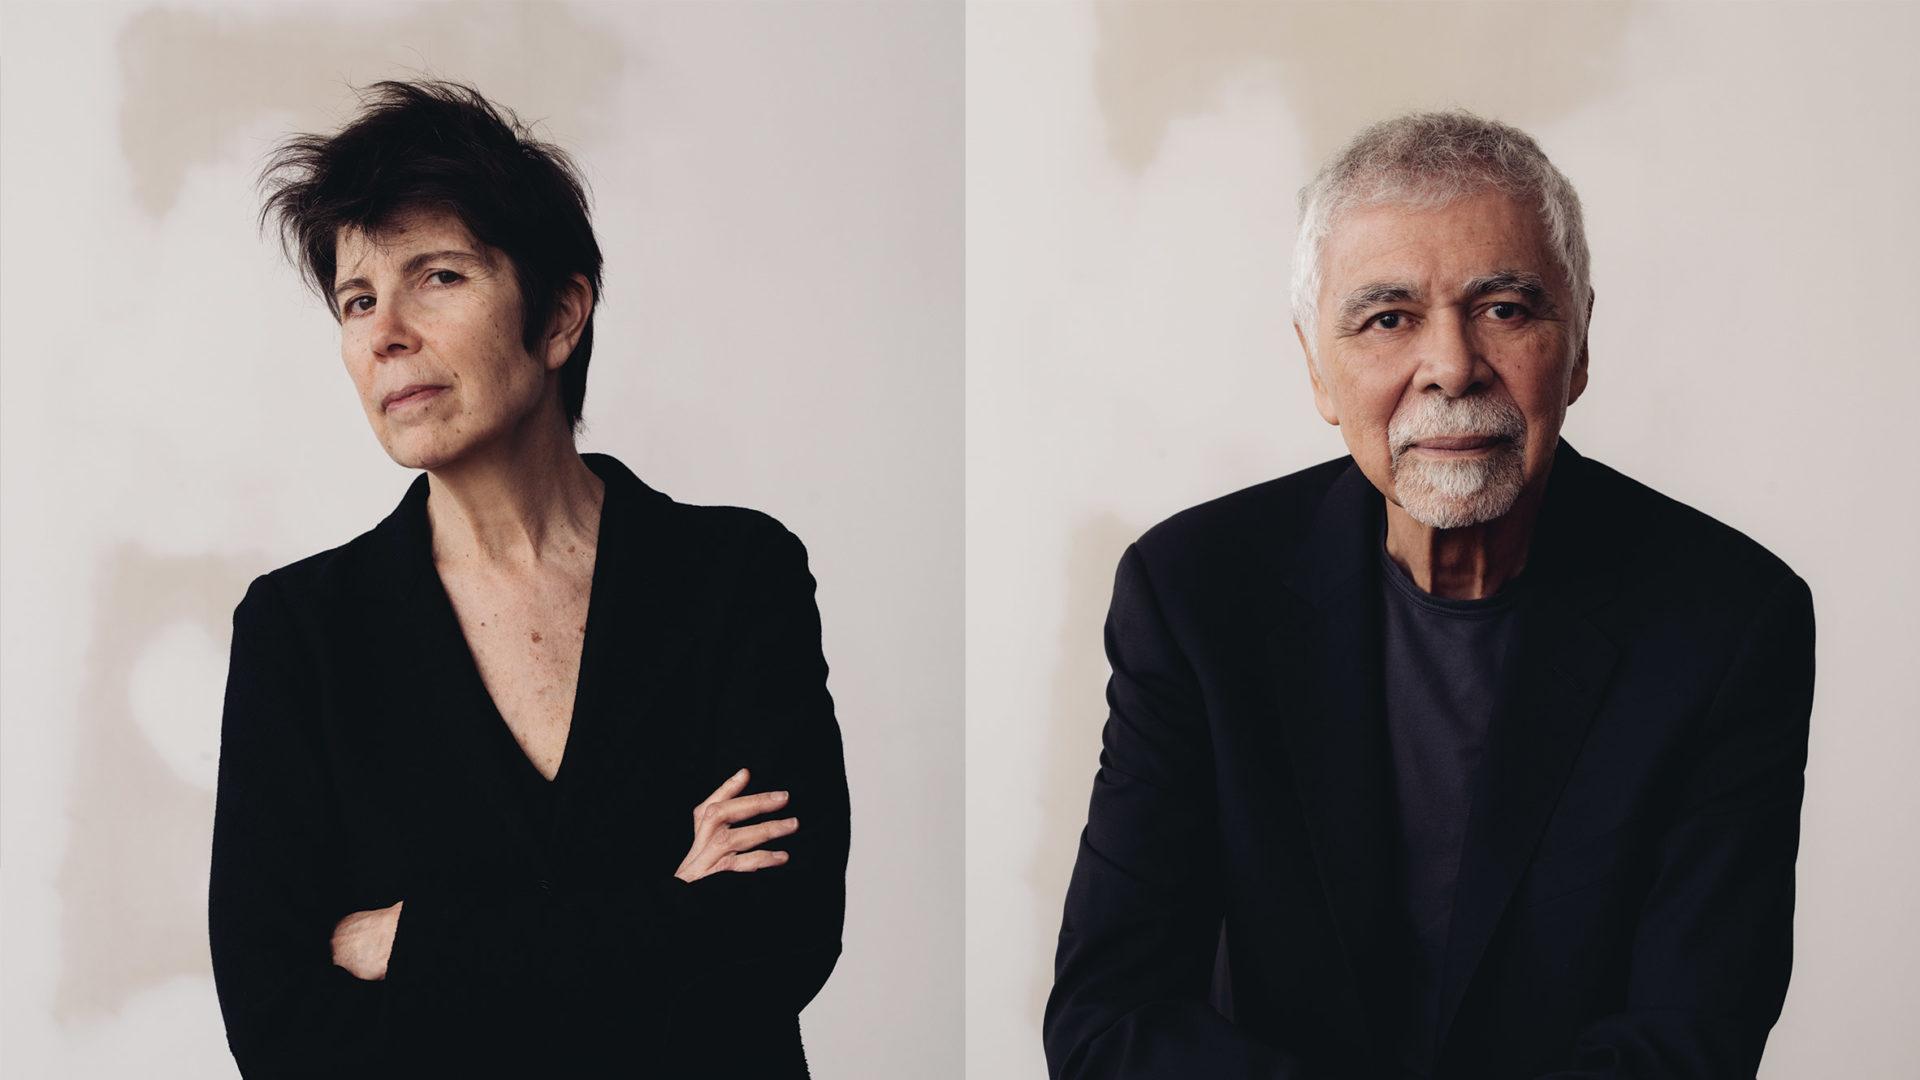 2019-royal-academy-architecture-prize-elizabeth-diller-ricardo-scofidio-hero_a